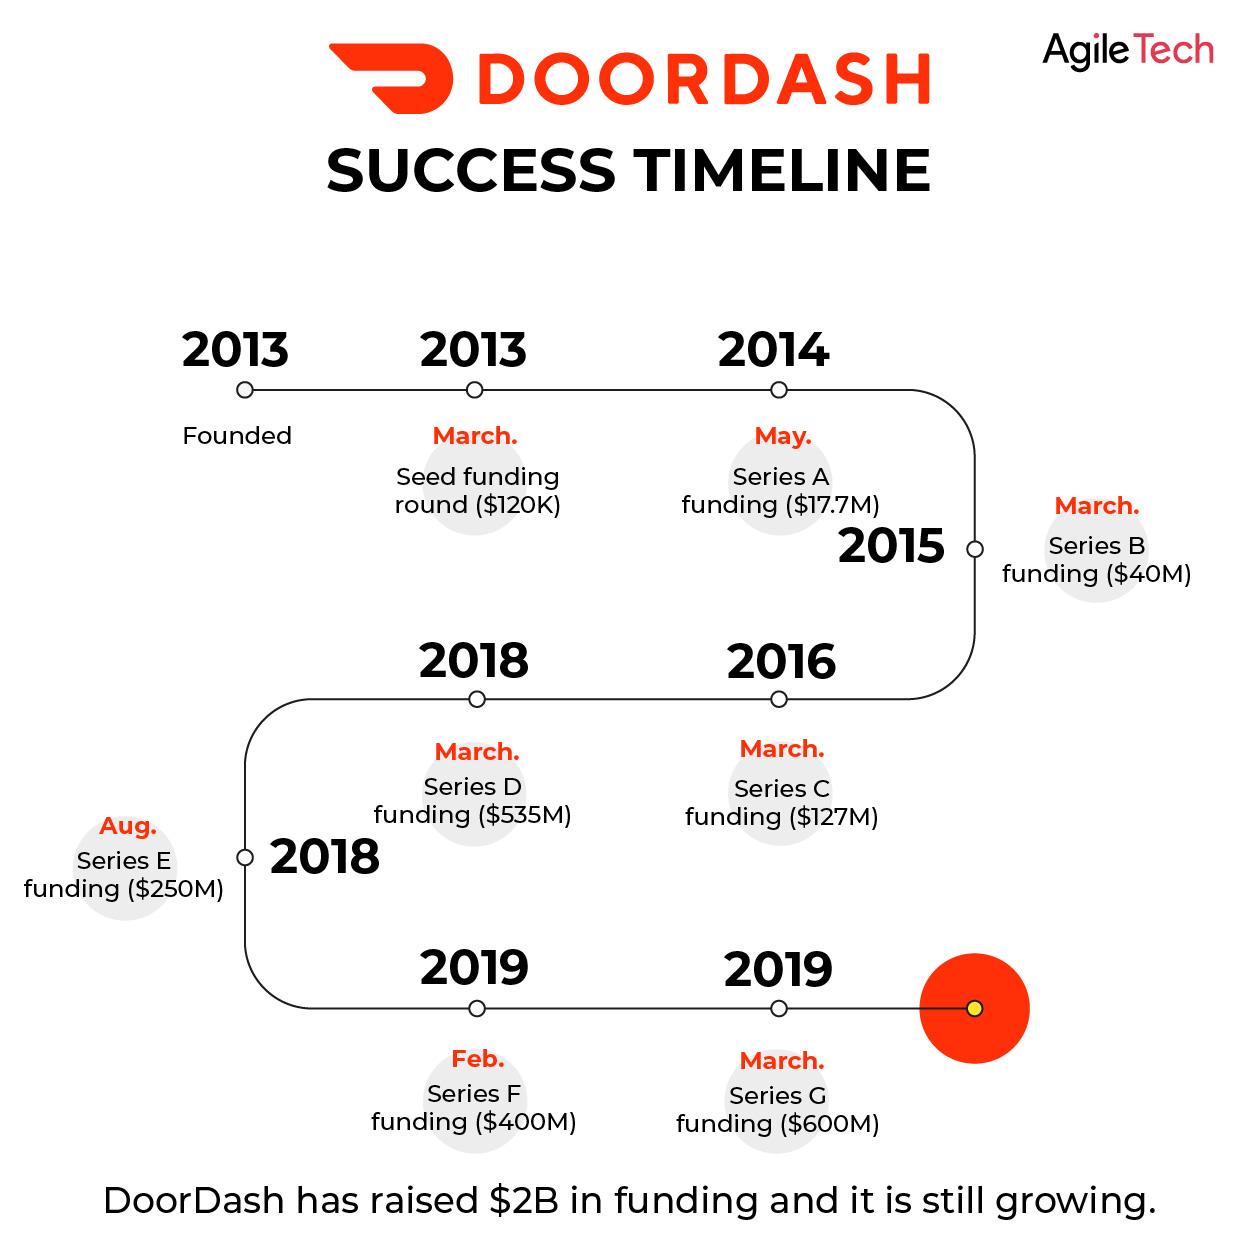 doordash success story, doordash on-demand platform raised $2B funding, agile